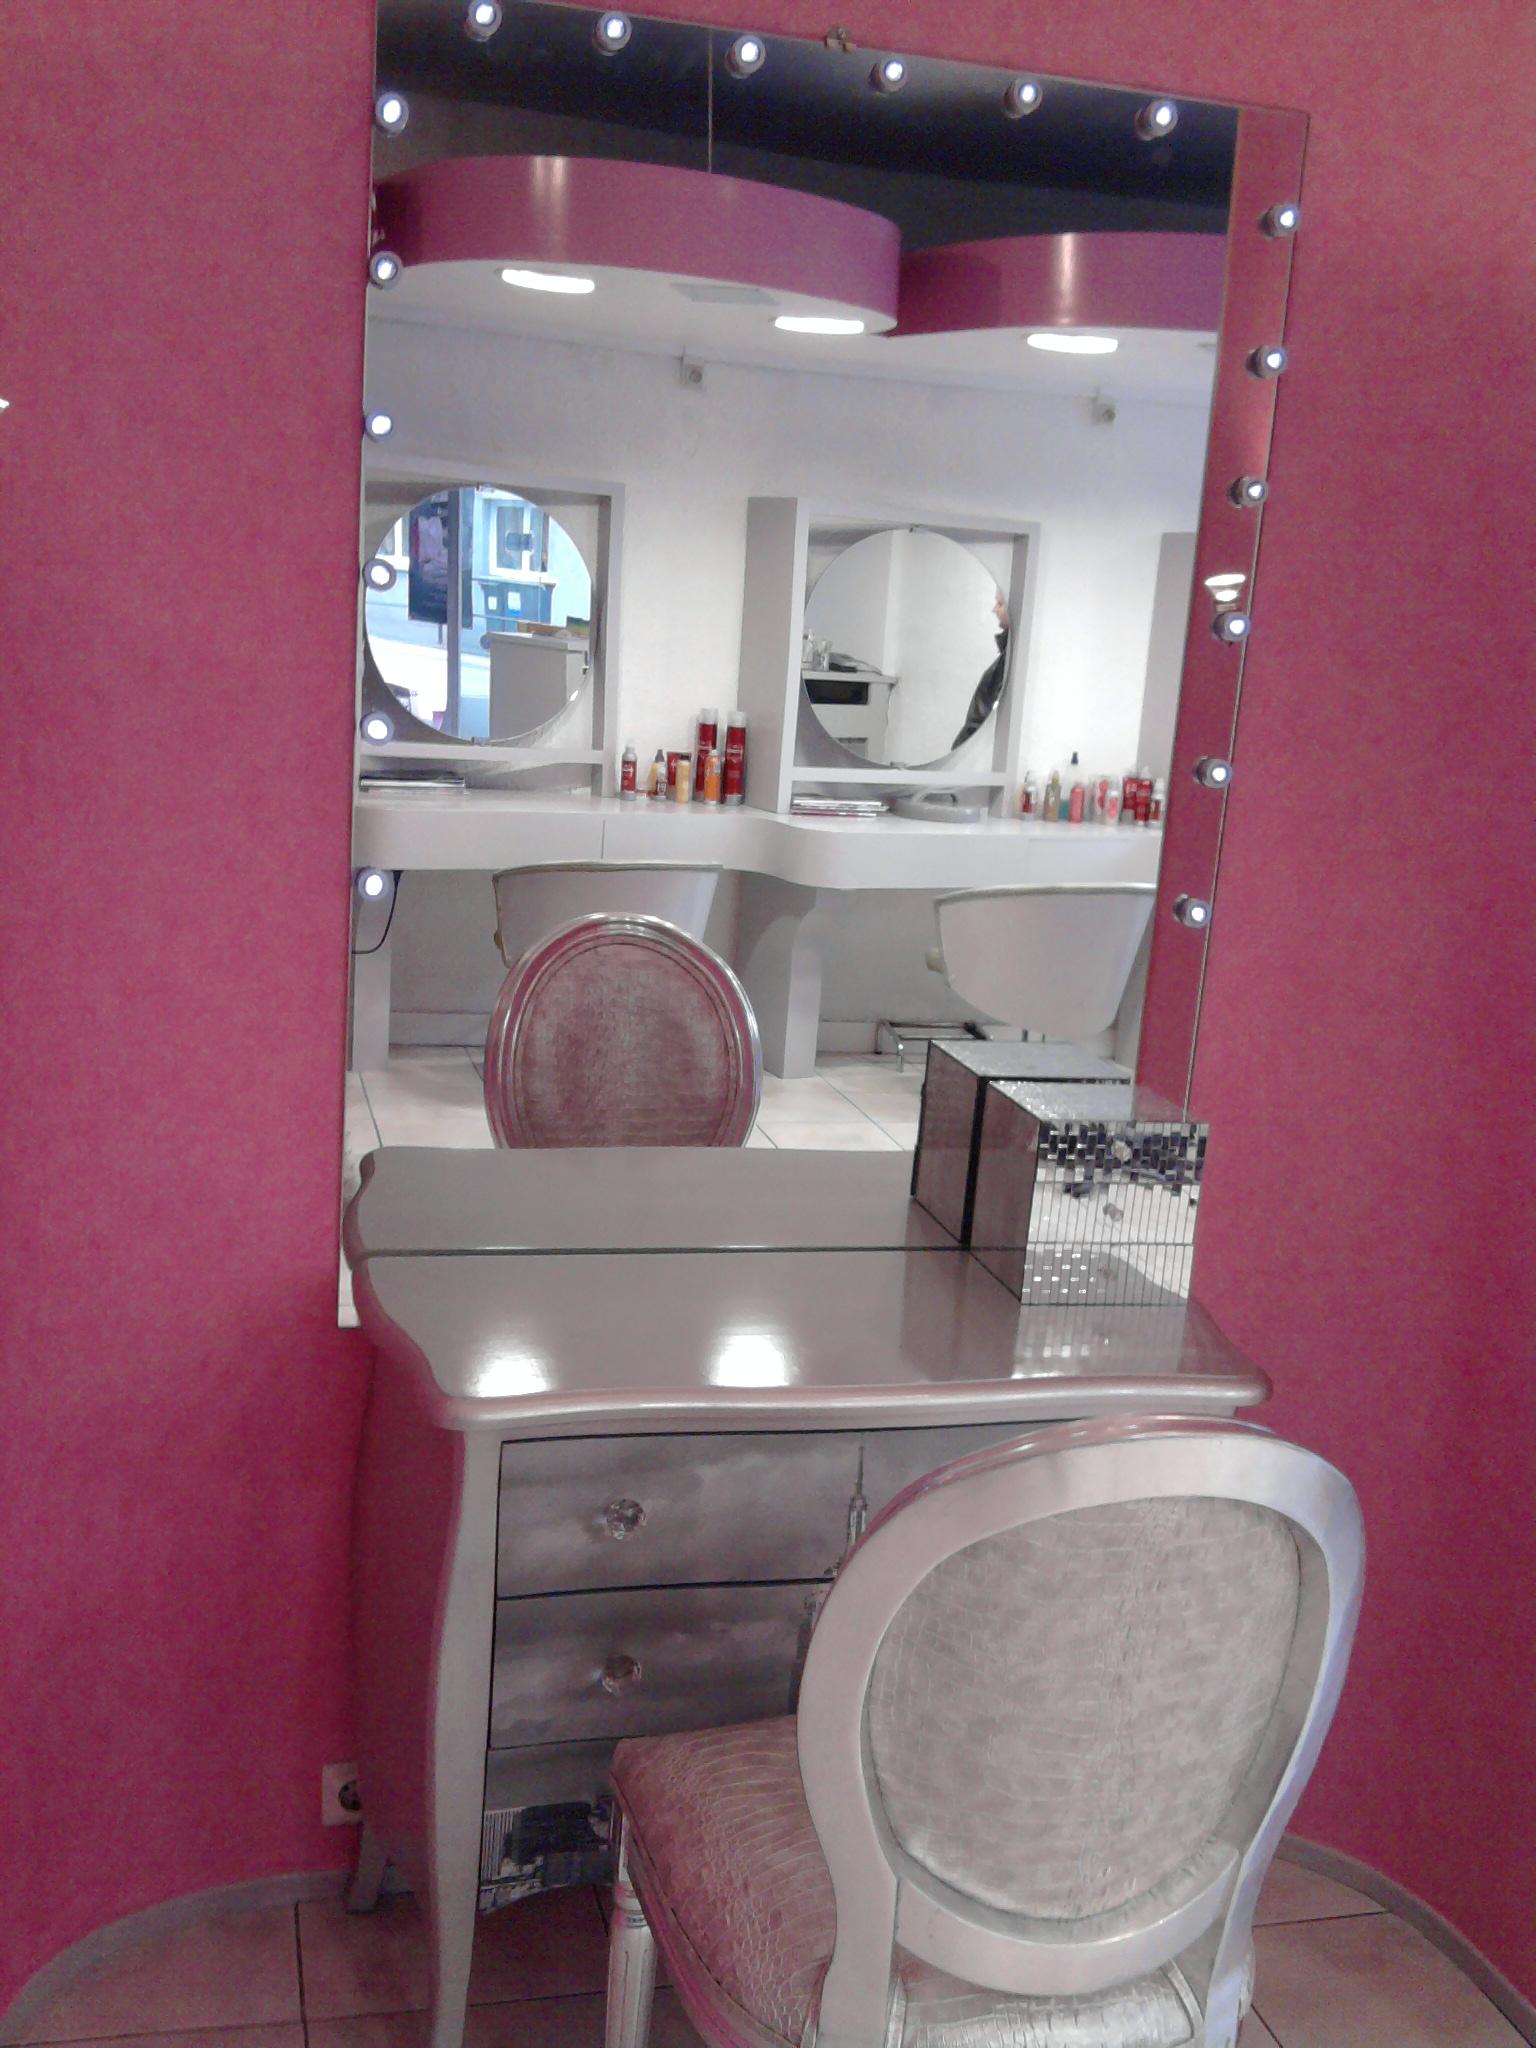 mille et une coiffures vesoul avis tarifs horaires. Black Bedroom Furniture Sets. Home Design Ideas